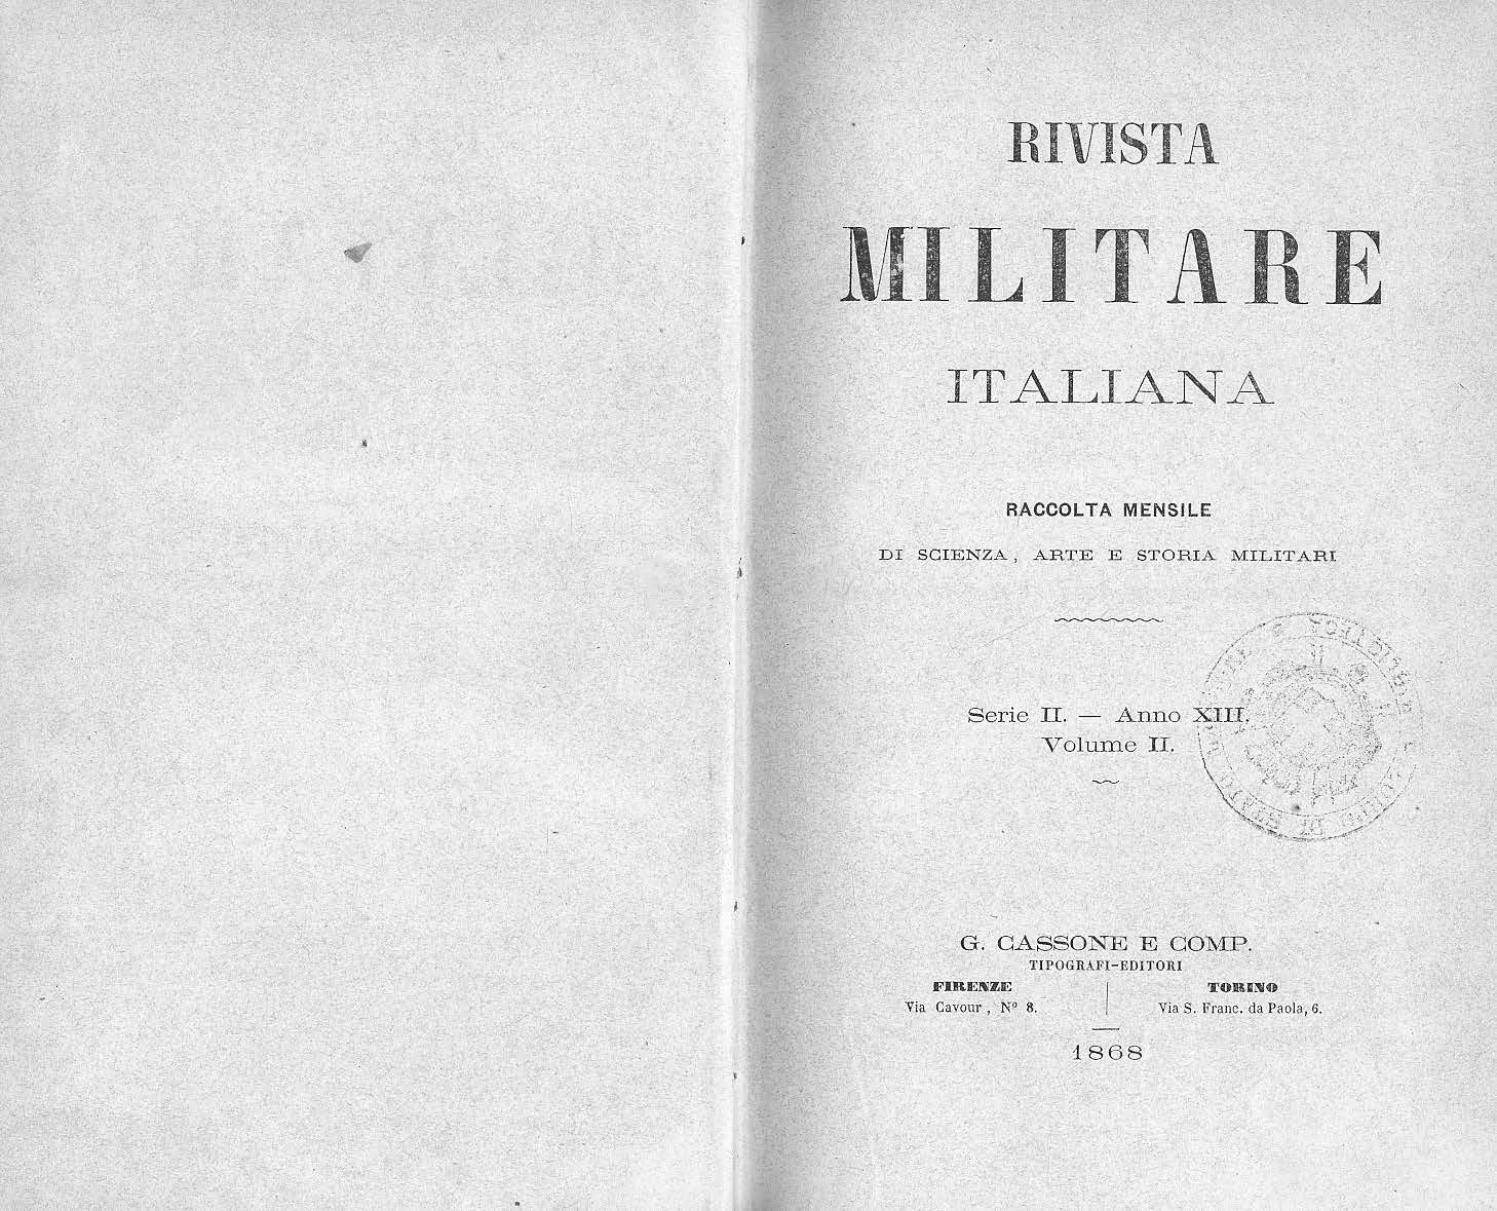 RIVISTA MILITARE 1868 TOMO II by Biblioteca Militare - issuu 6be1ae5c0dd4